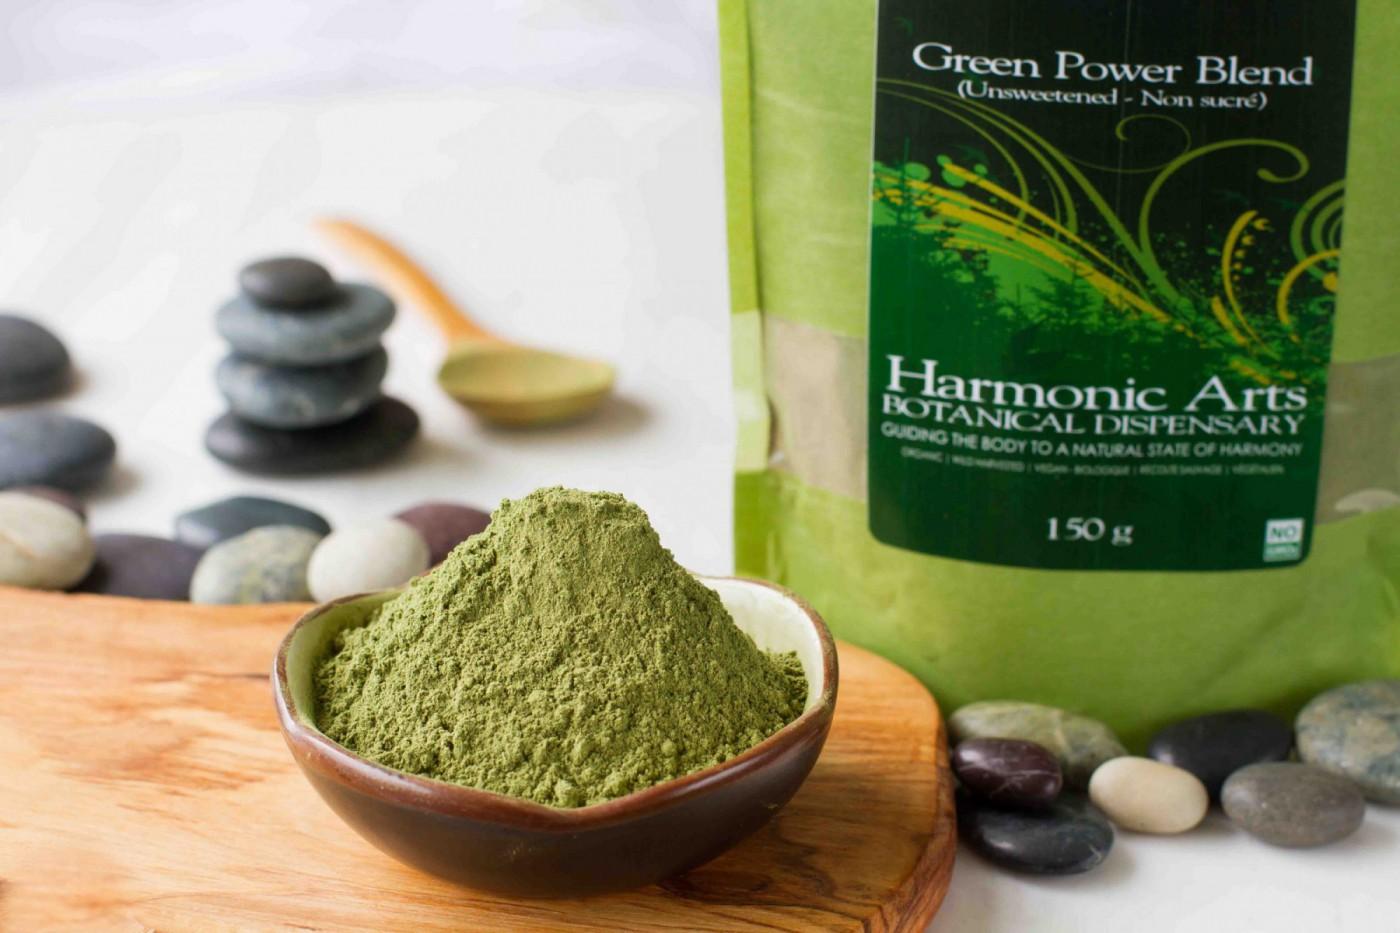 Harmonic Arts - Green Power Blend